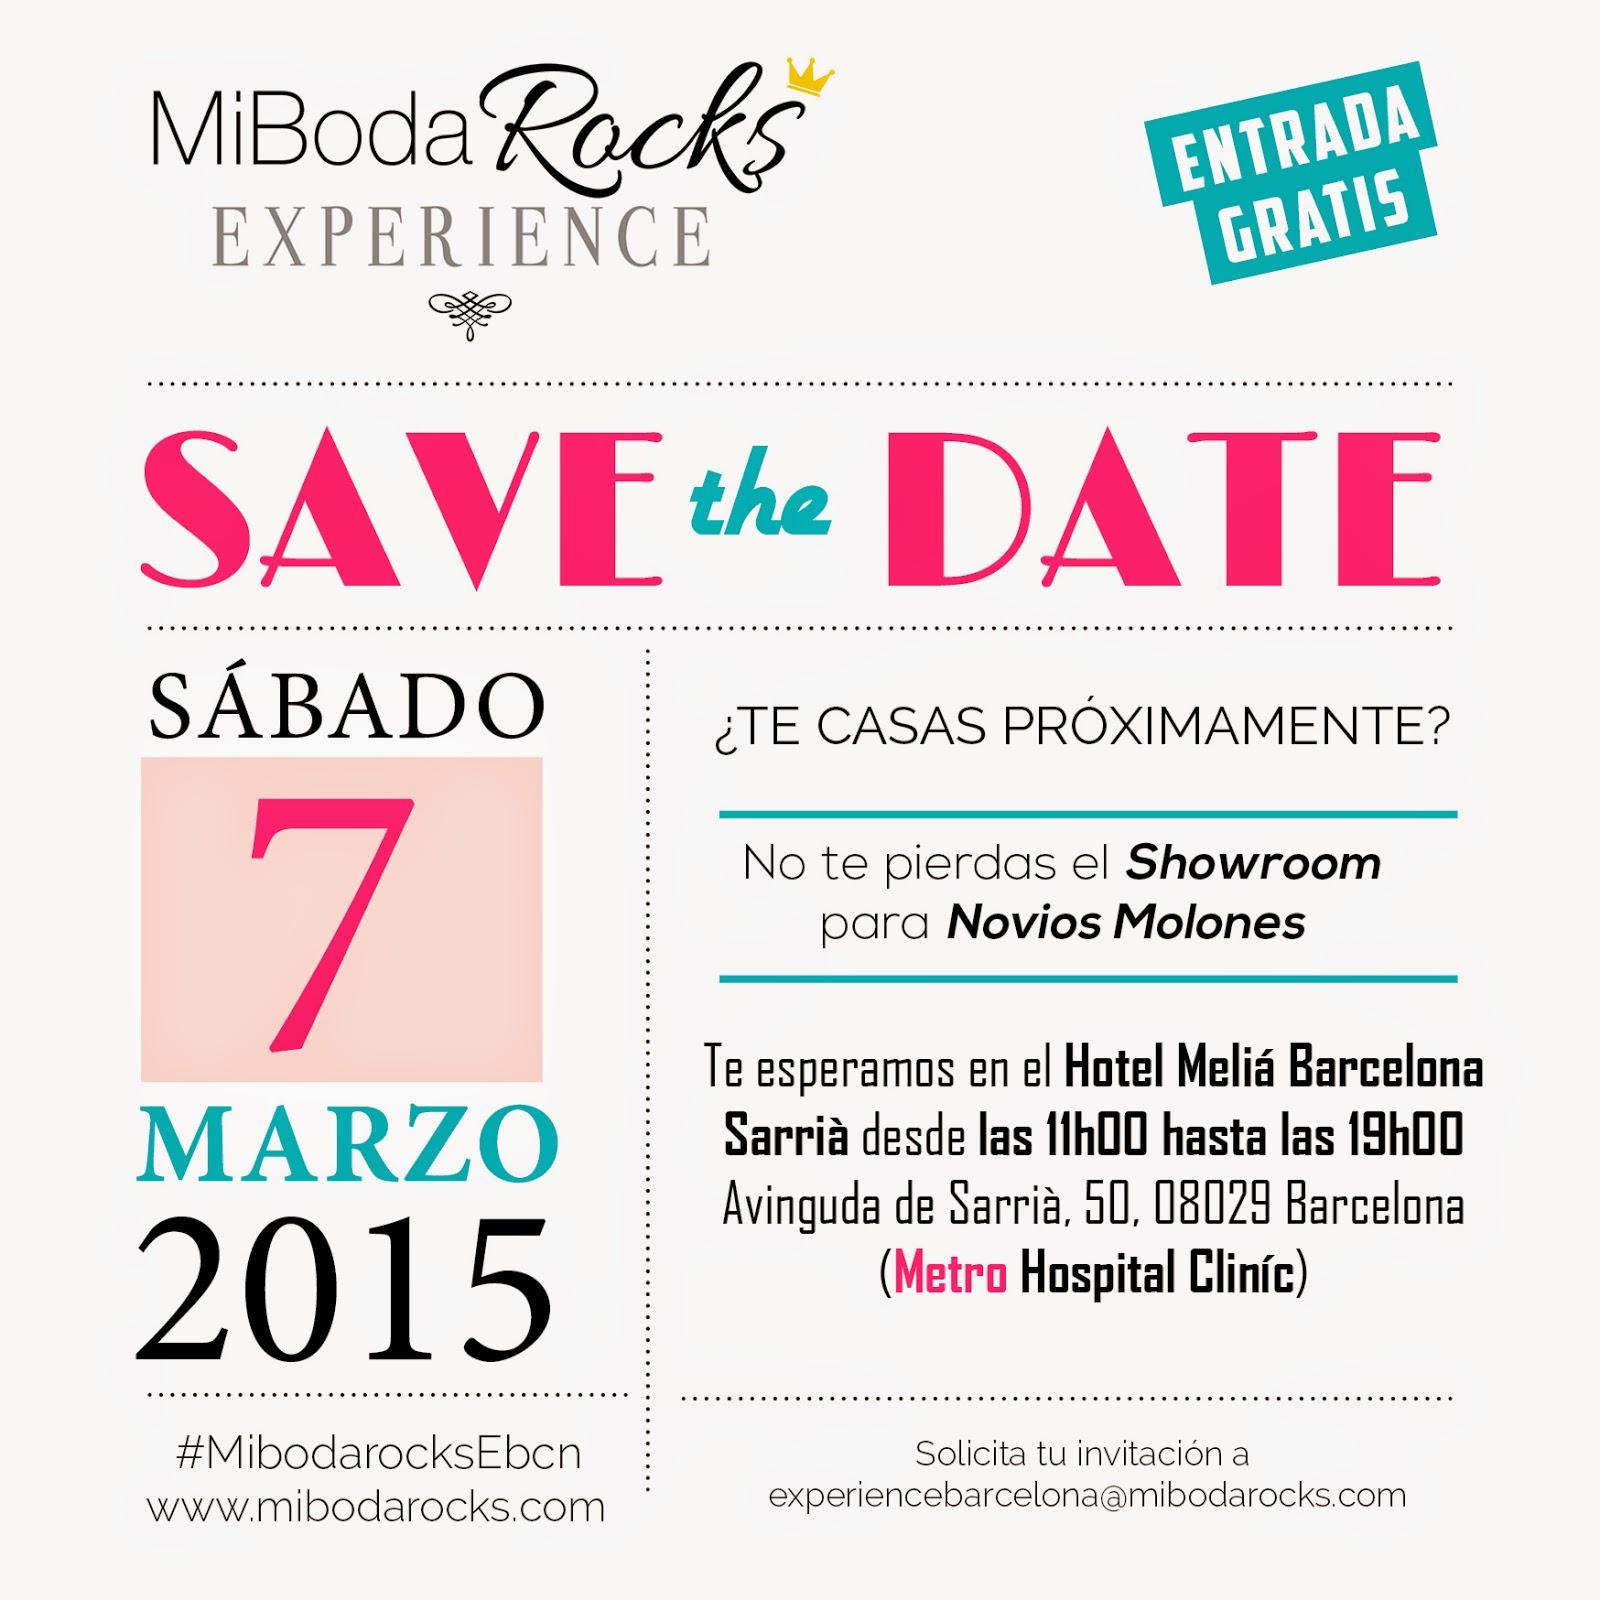 7 de marzo 2015 Mi Boda Rocks Experience Barcelona